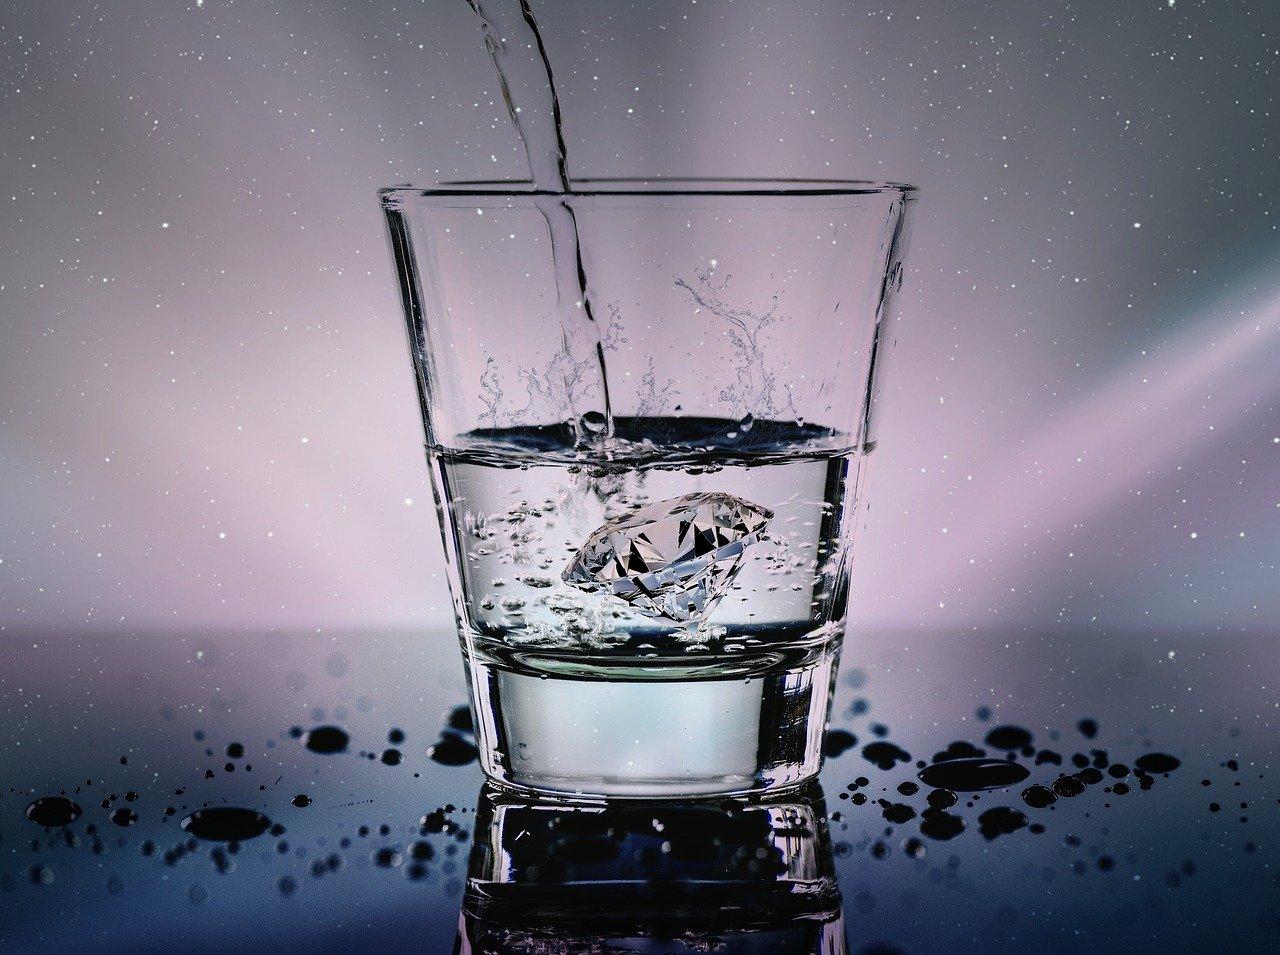 Hexagonales Wasser mit hexagonaler Struktur mehr Energie